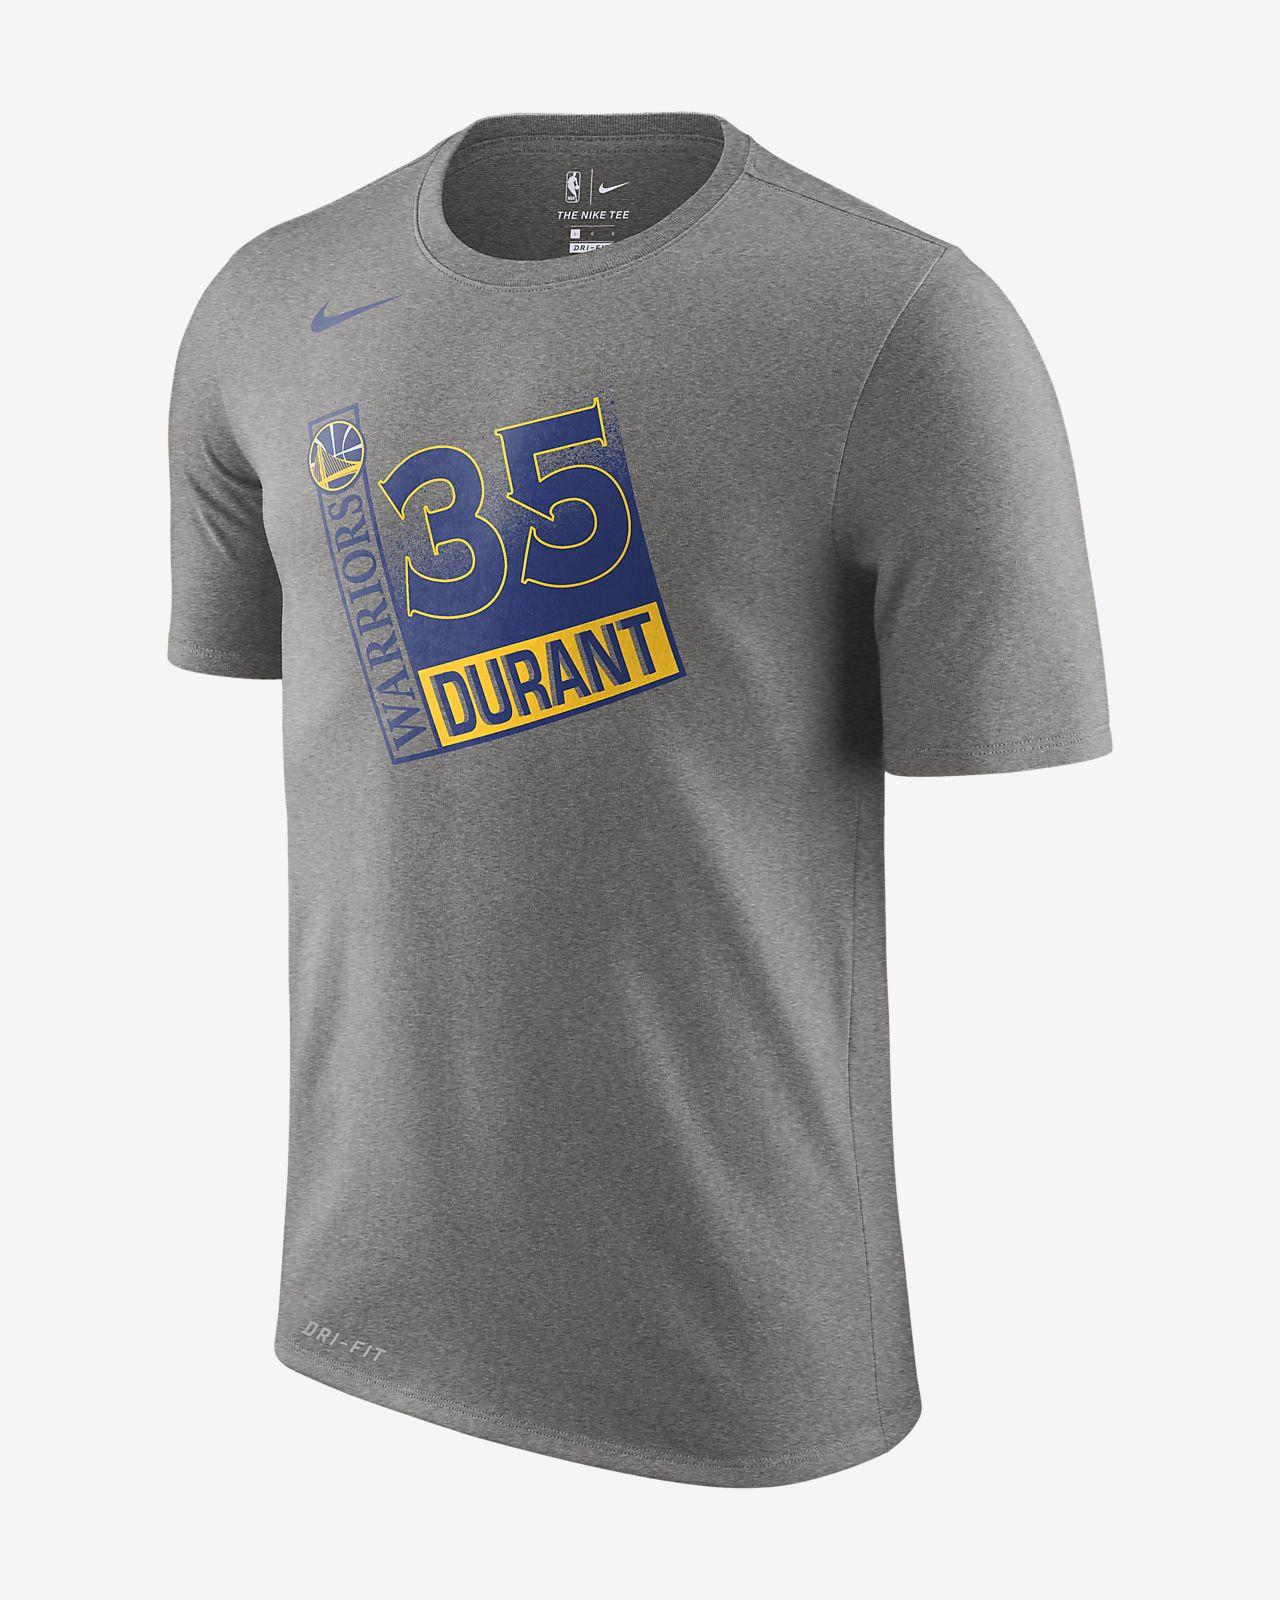 Kevin Durant Golden State Warriors Nike Dri-FIT Men's NBA T-Shirt